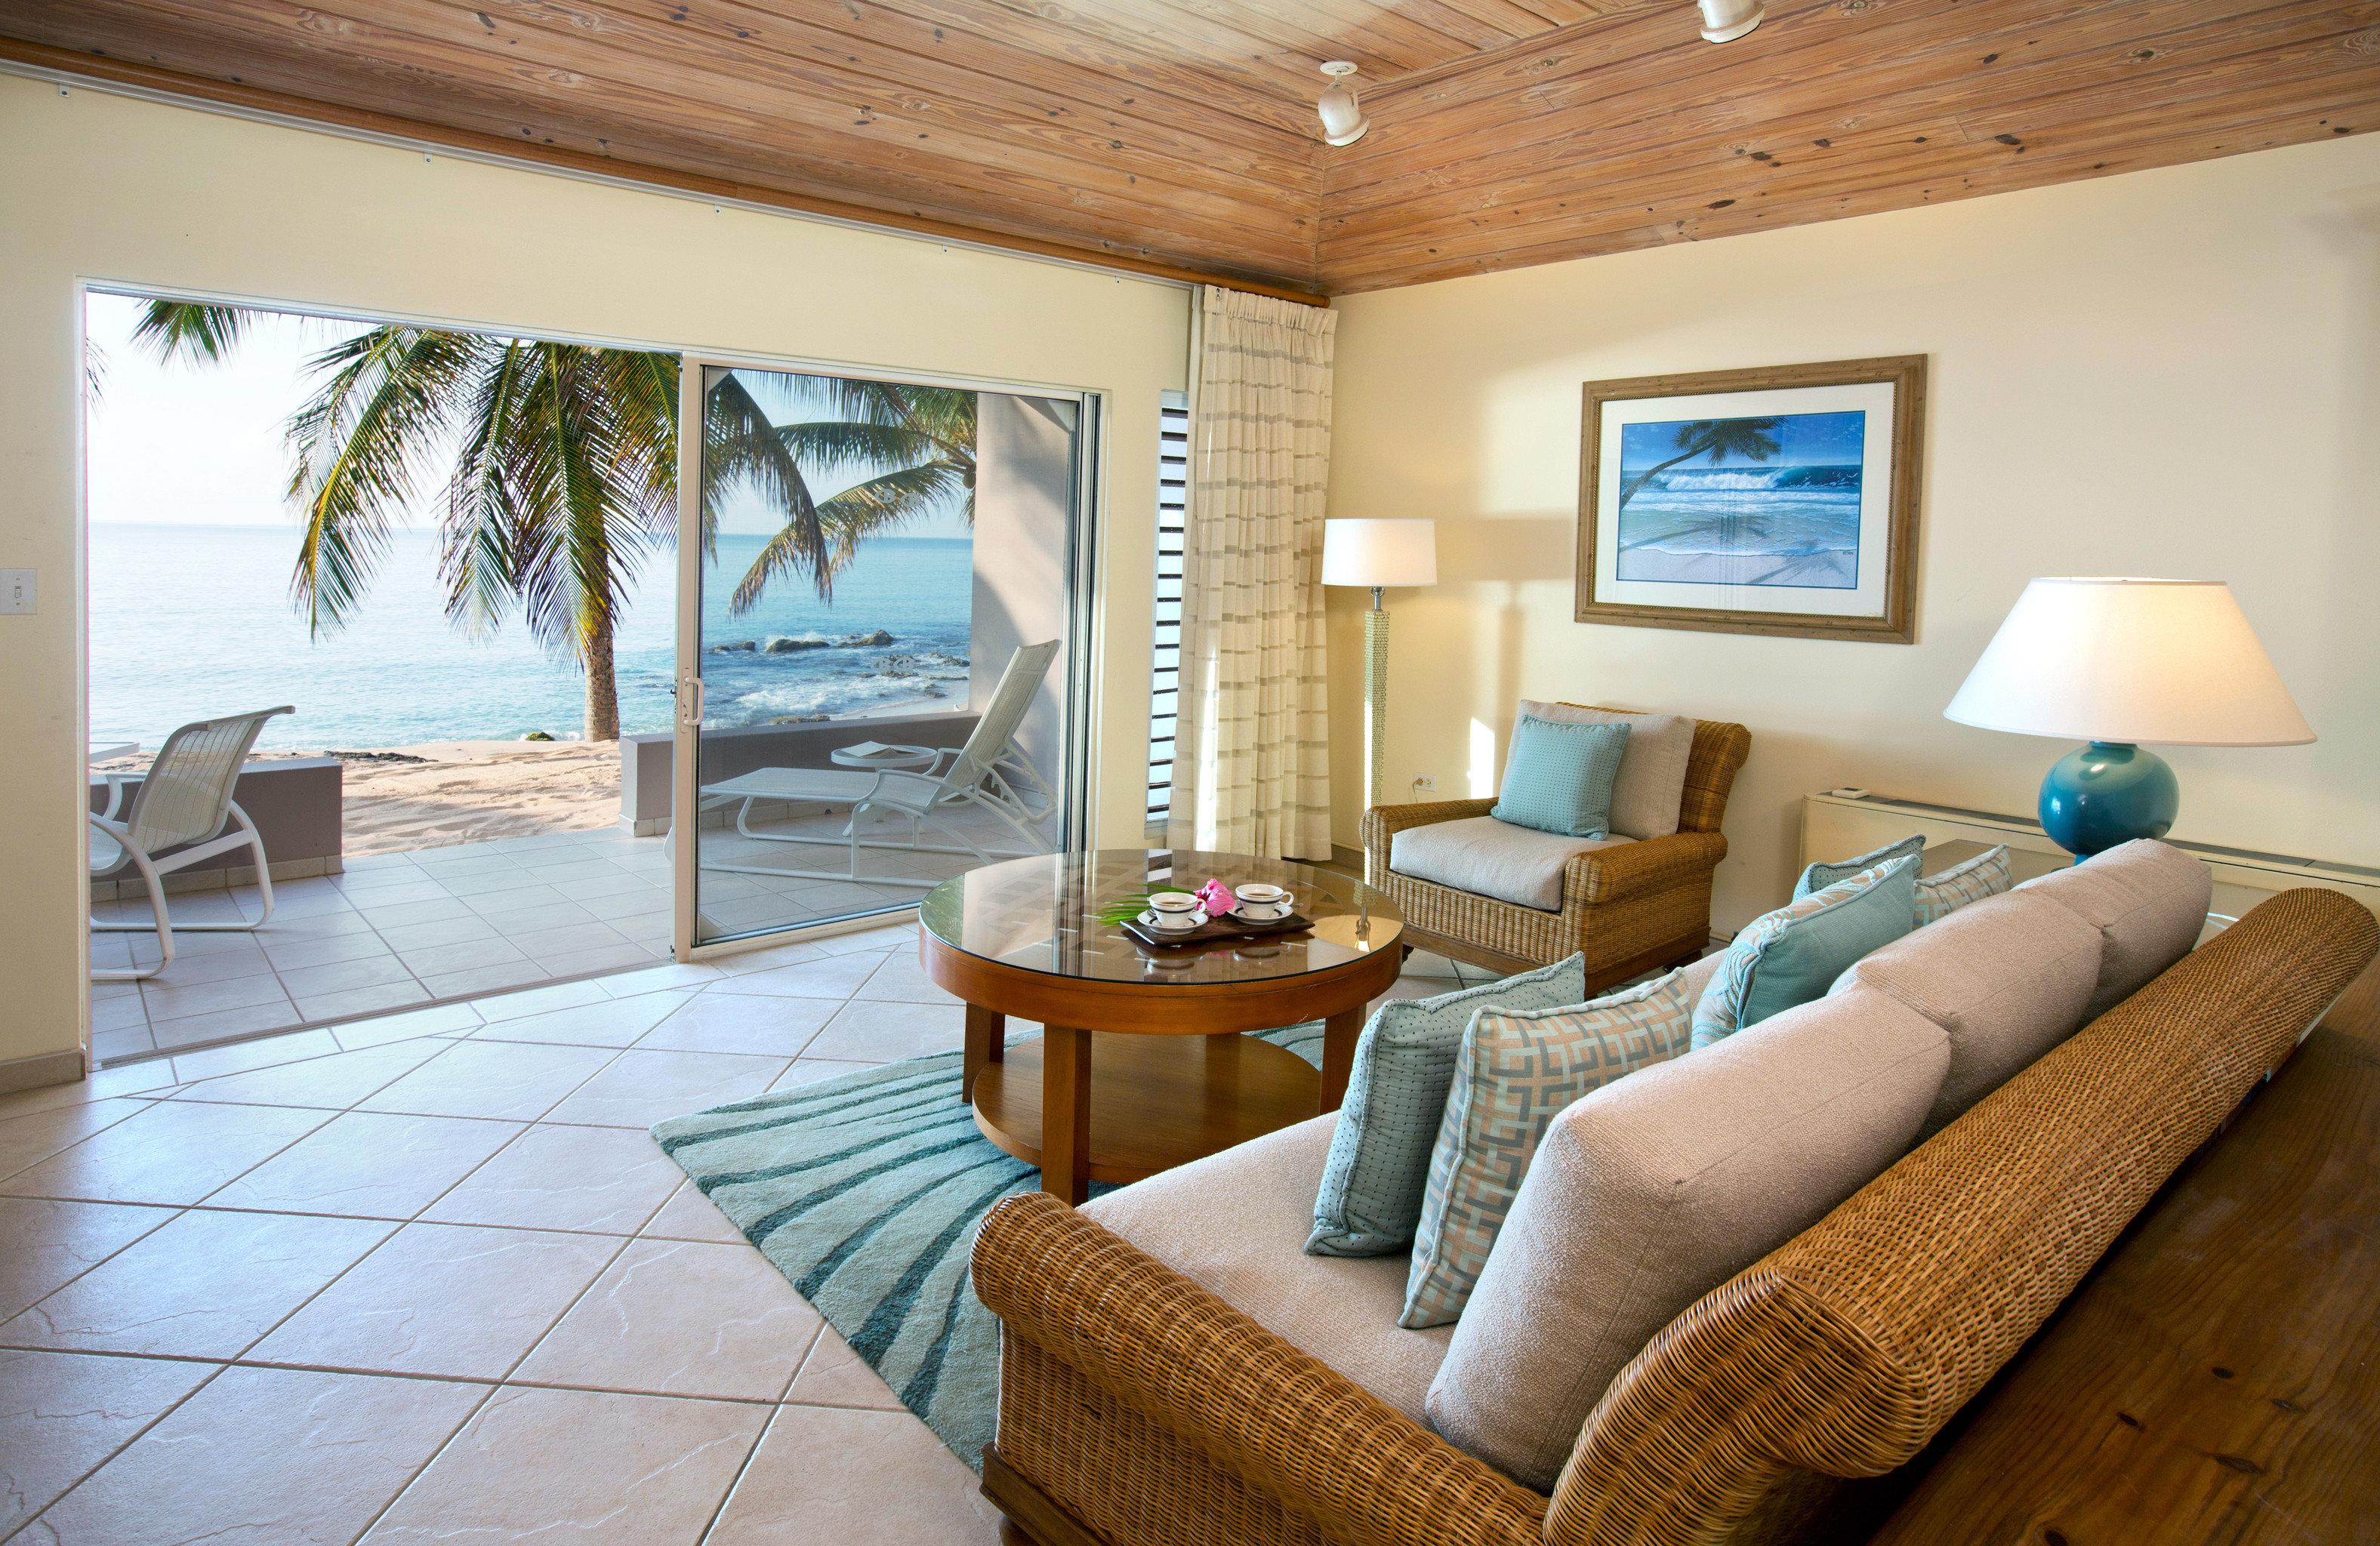 Beachfront Honeymoon Island Romance Romantic Suite Terrace Tropical property living room home Villa cottage condominium Resort